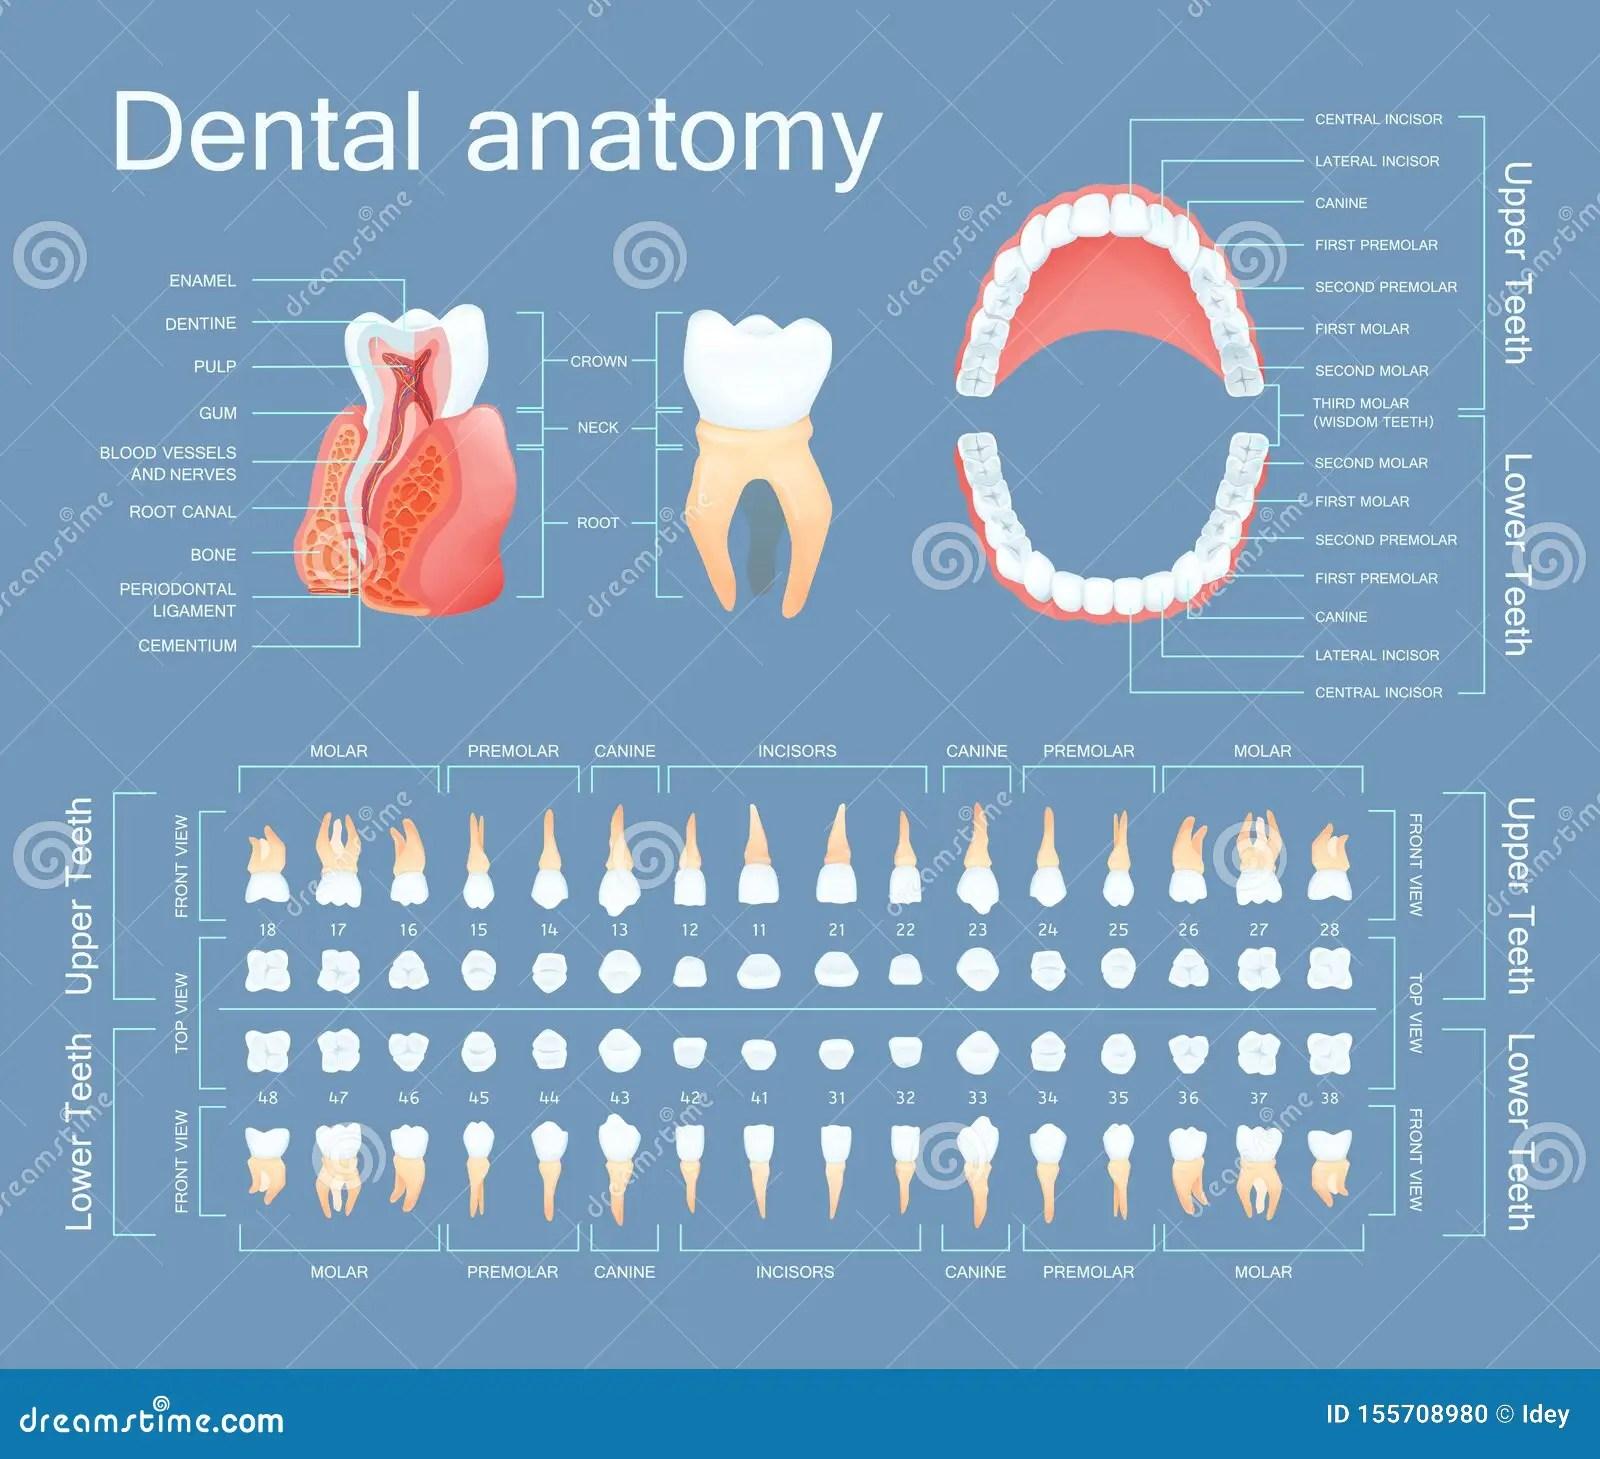 Human Dental Anatomy Tooth Anatomy Numbering Infographics